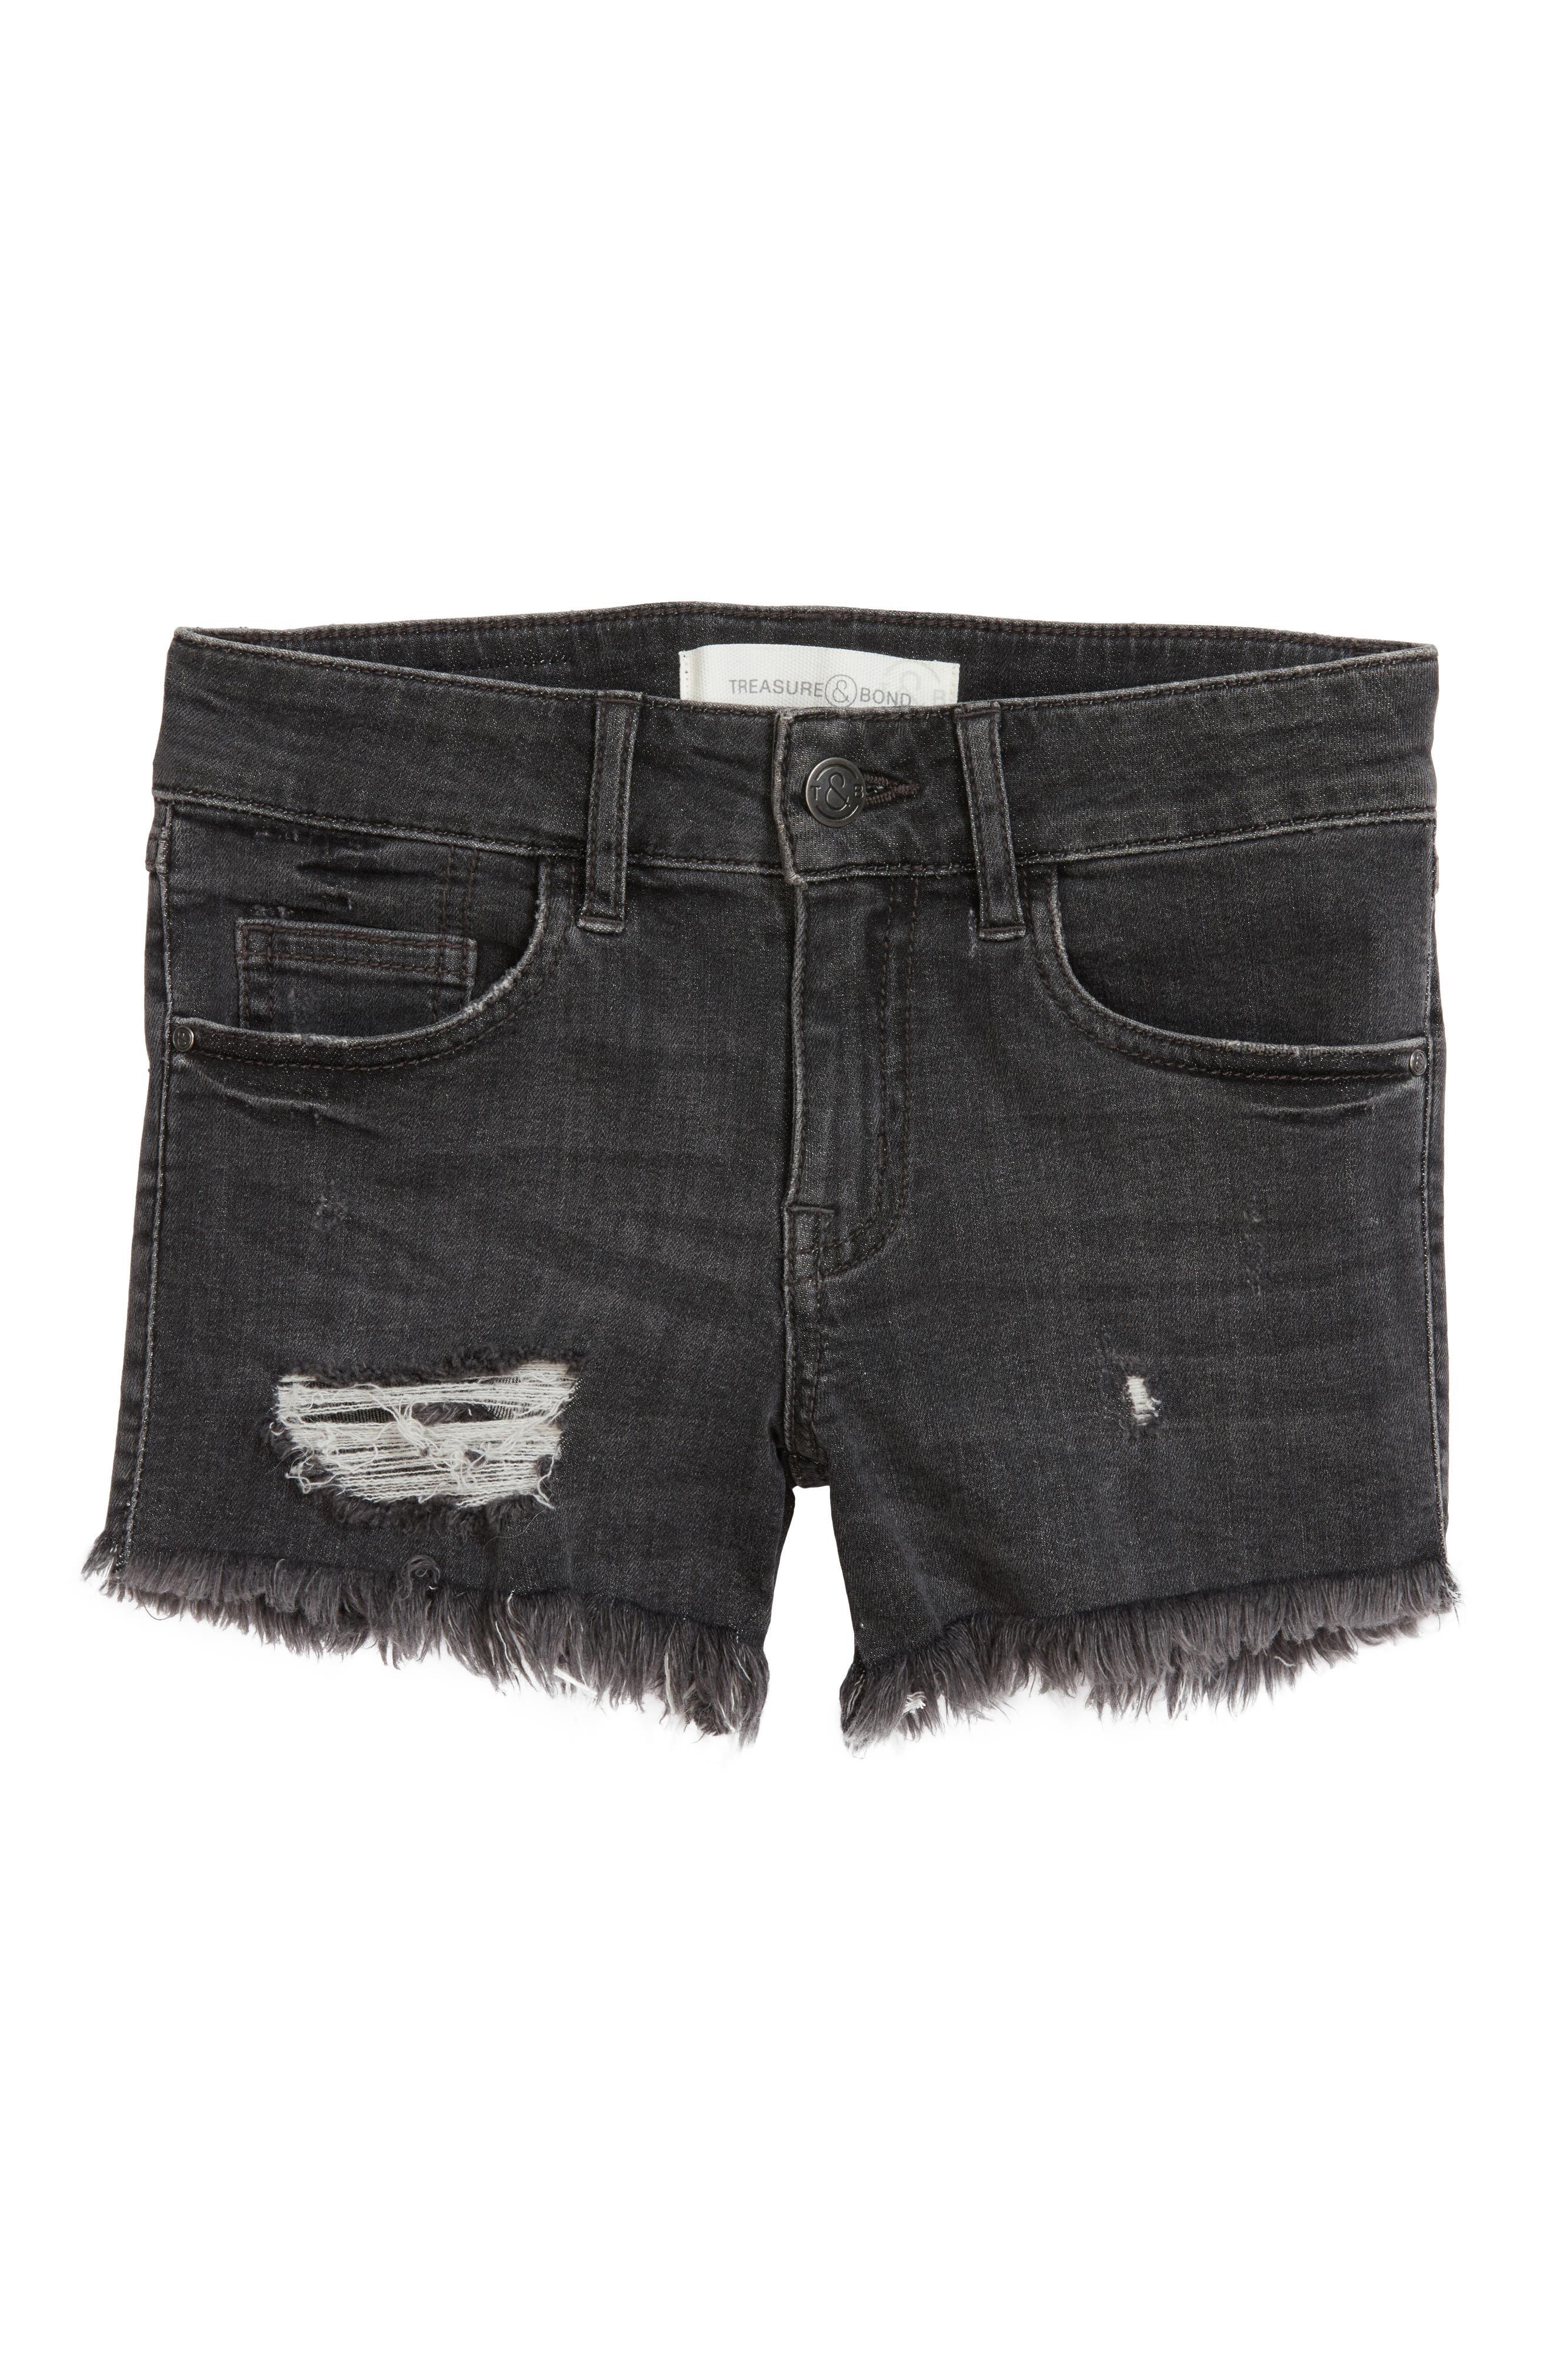 Distressed Cutoff Denim Shorts,                         Main,                         color, Black Vintage Wash